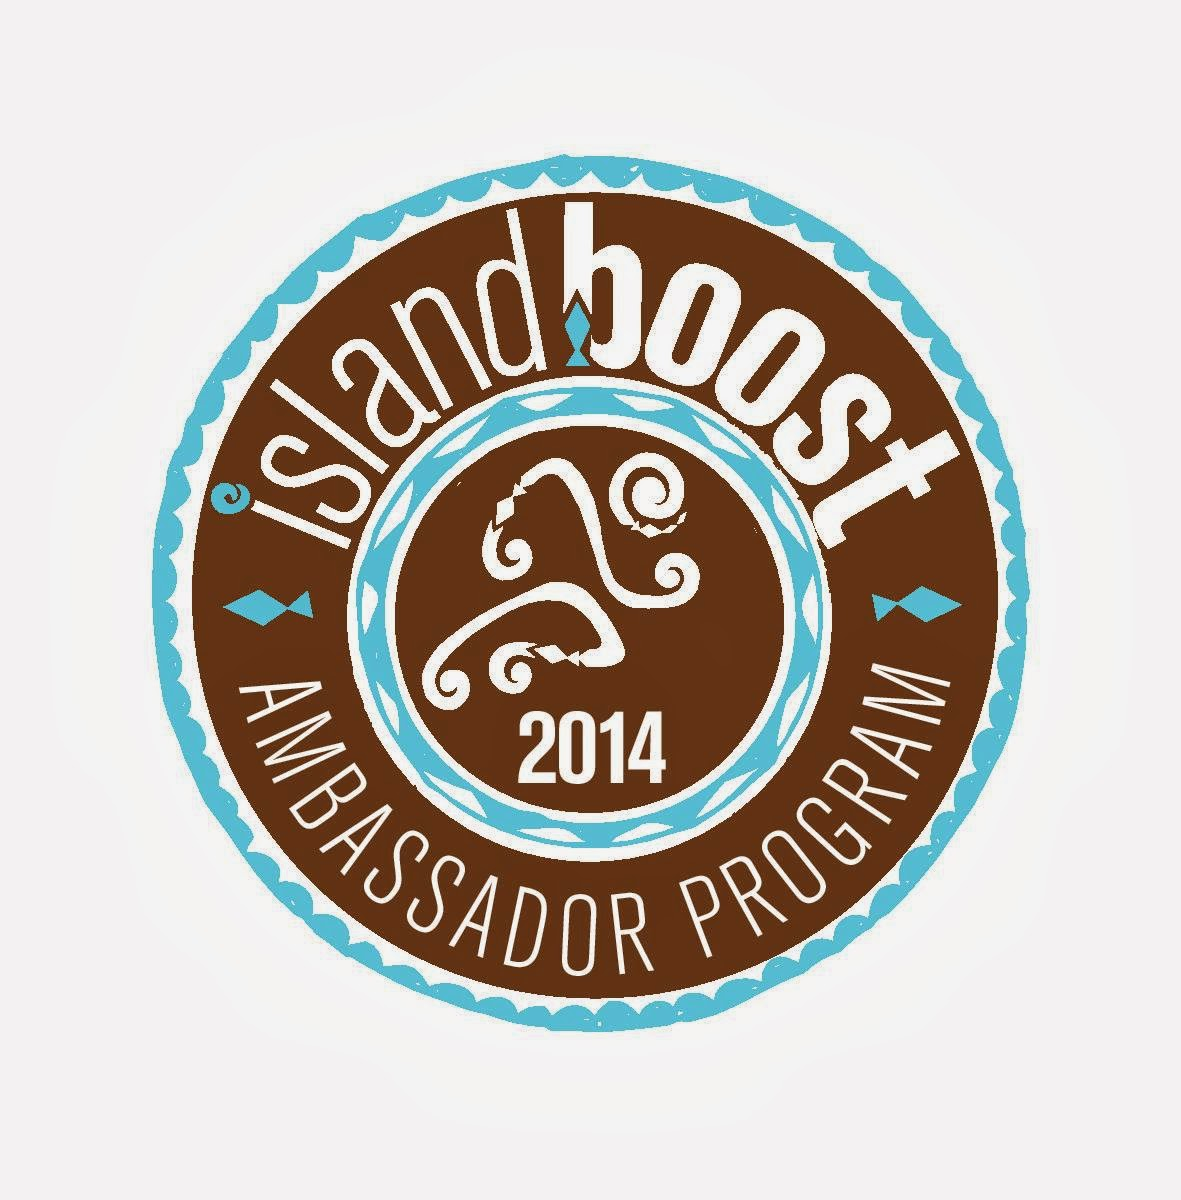 Island Boost Ambassador